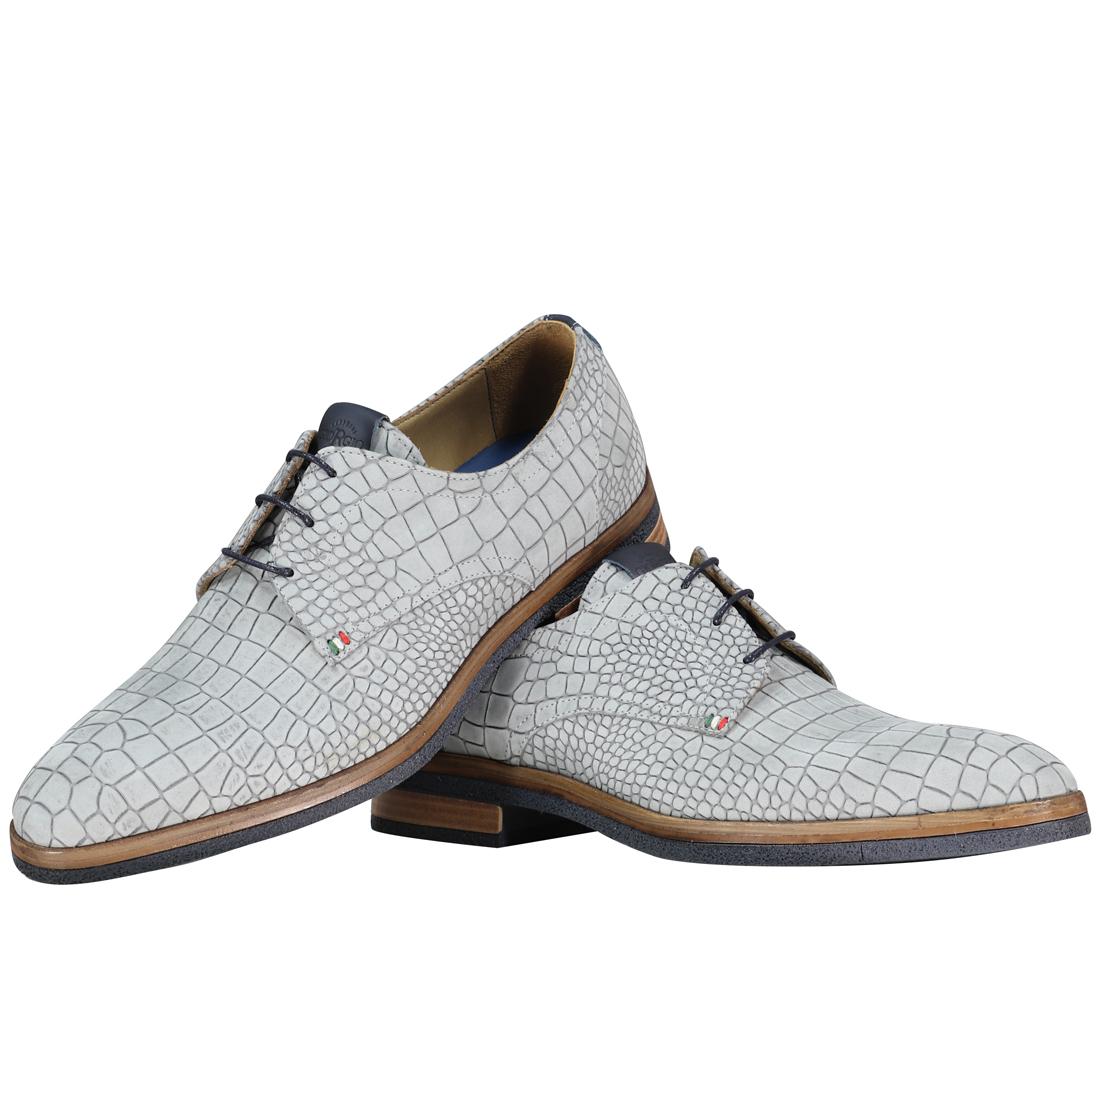 Giorgio schoenen 73503 molato in het Grijs